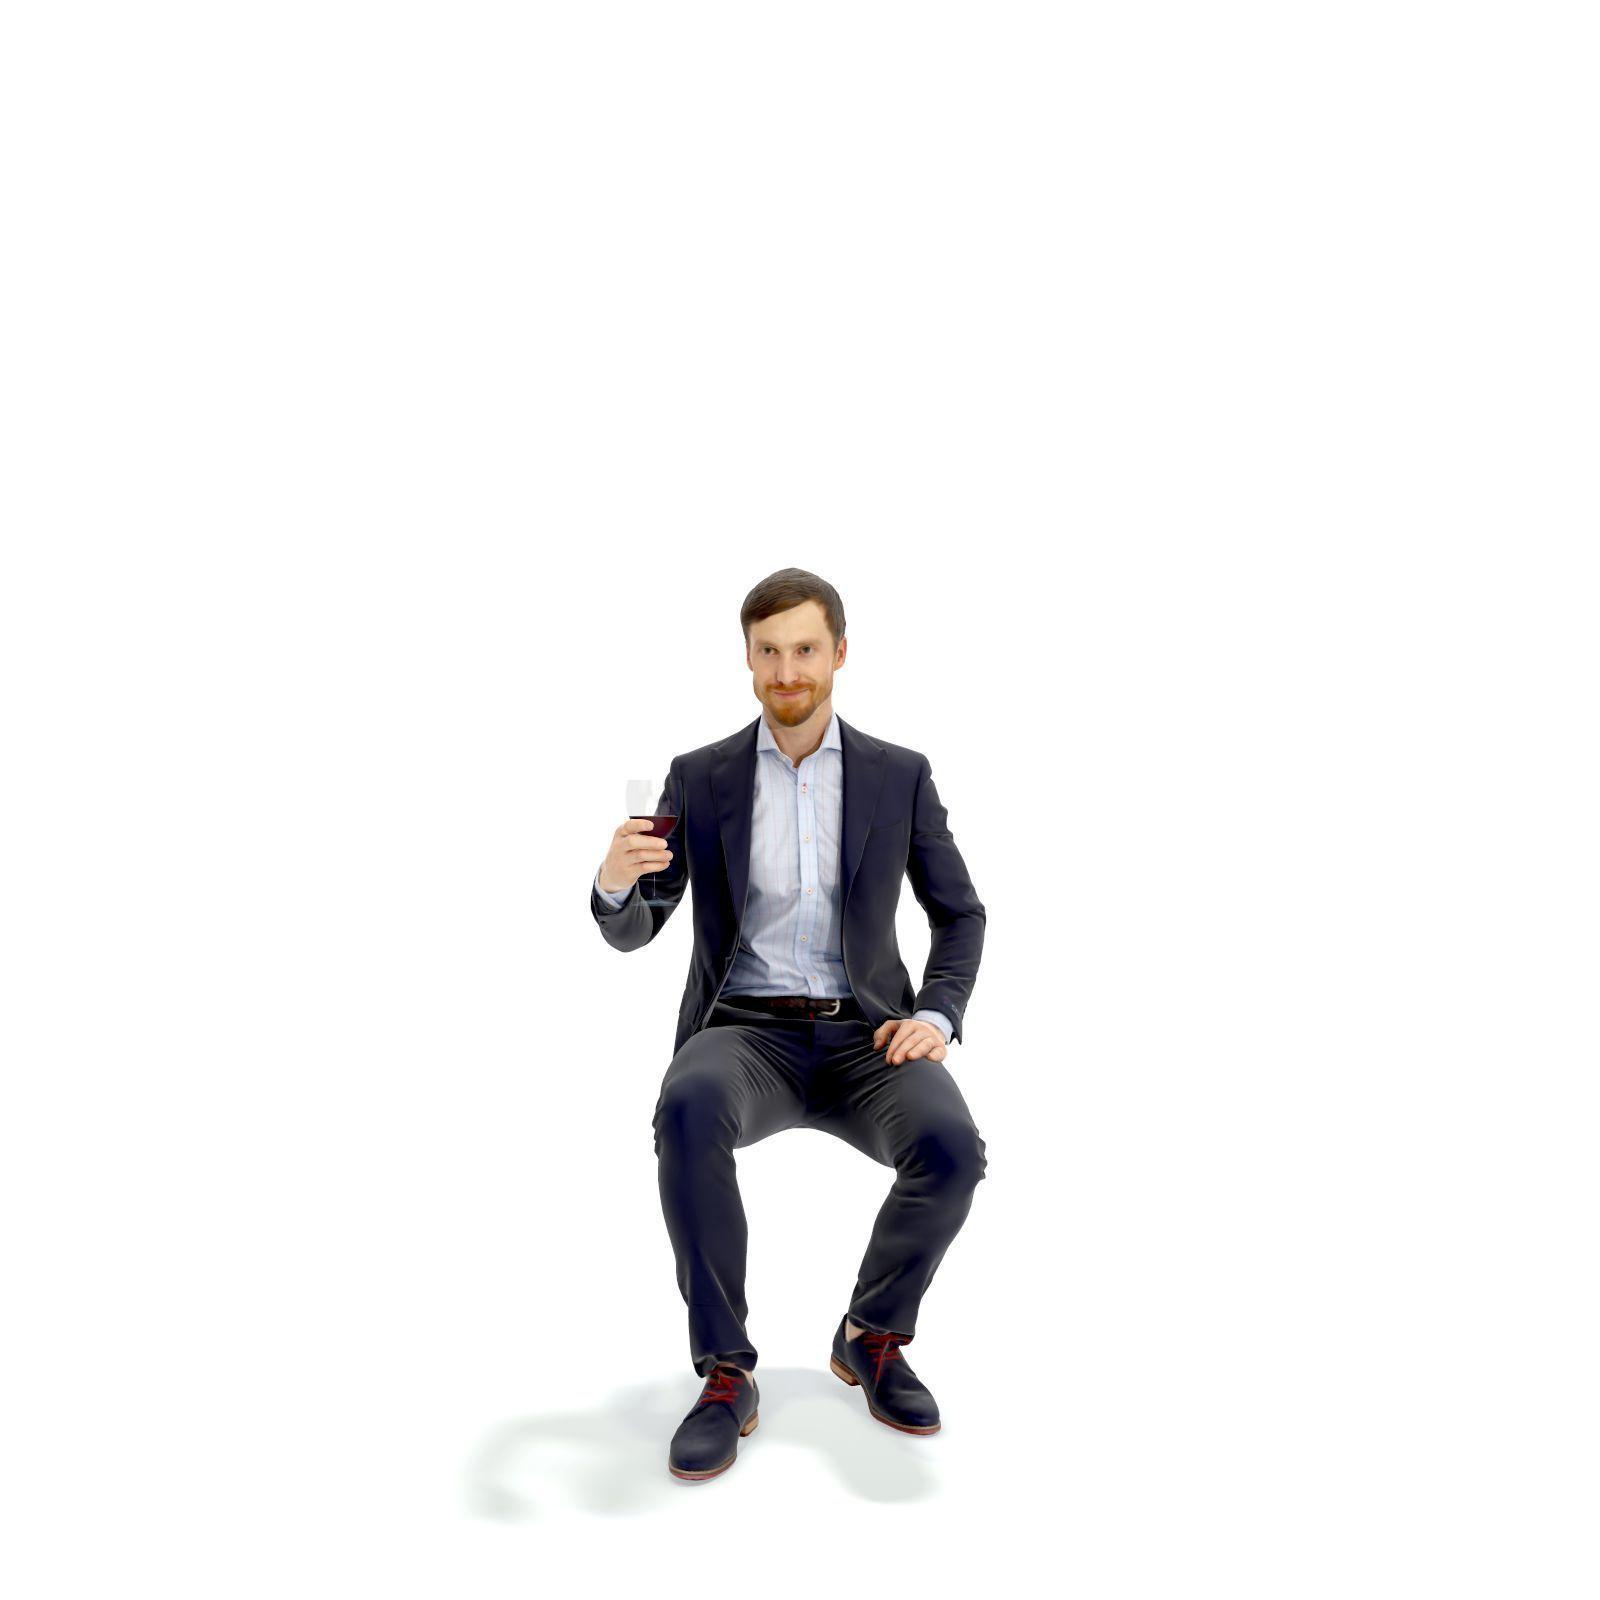 Sitting Elegant Man Cheering with Glass EMan0313-HD2-O03P01-S